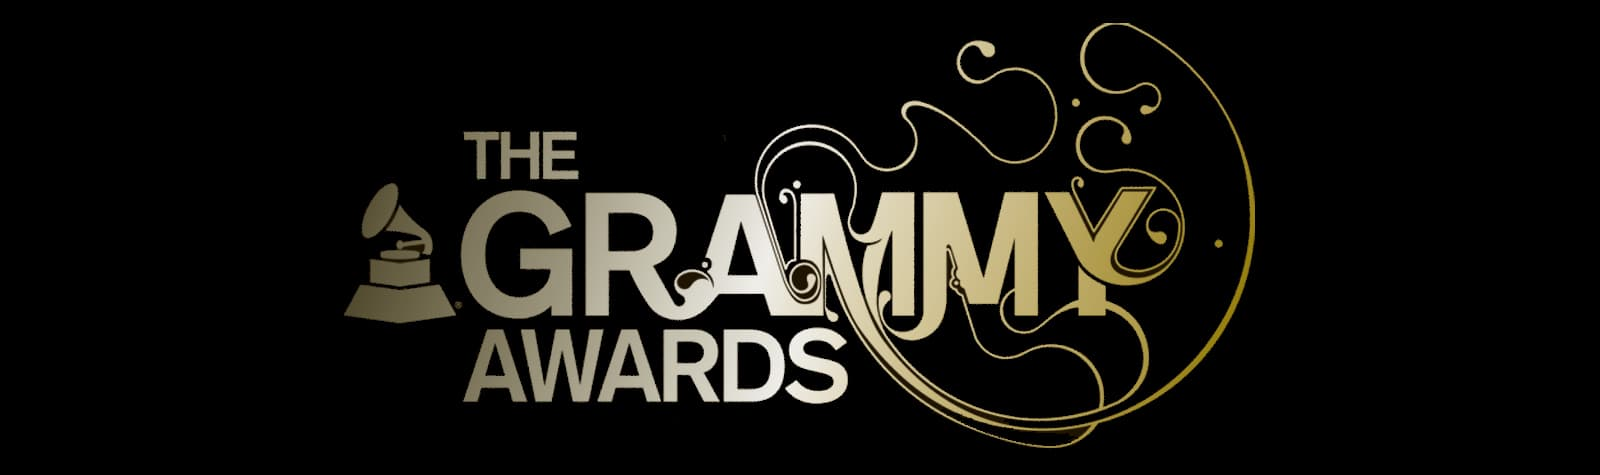 Objavljene nominacije za prestižnu dodelu (foto: Forbes)